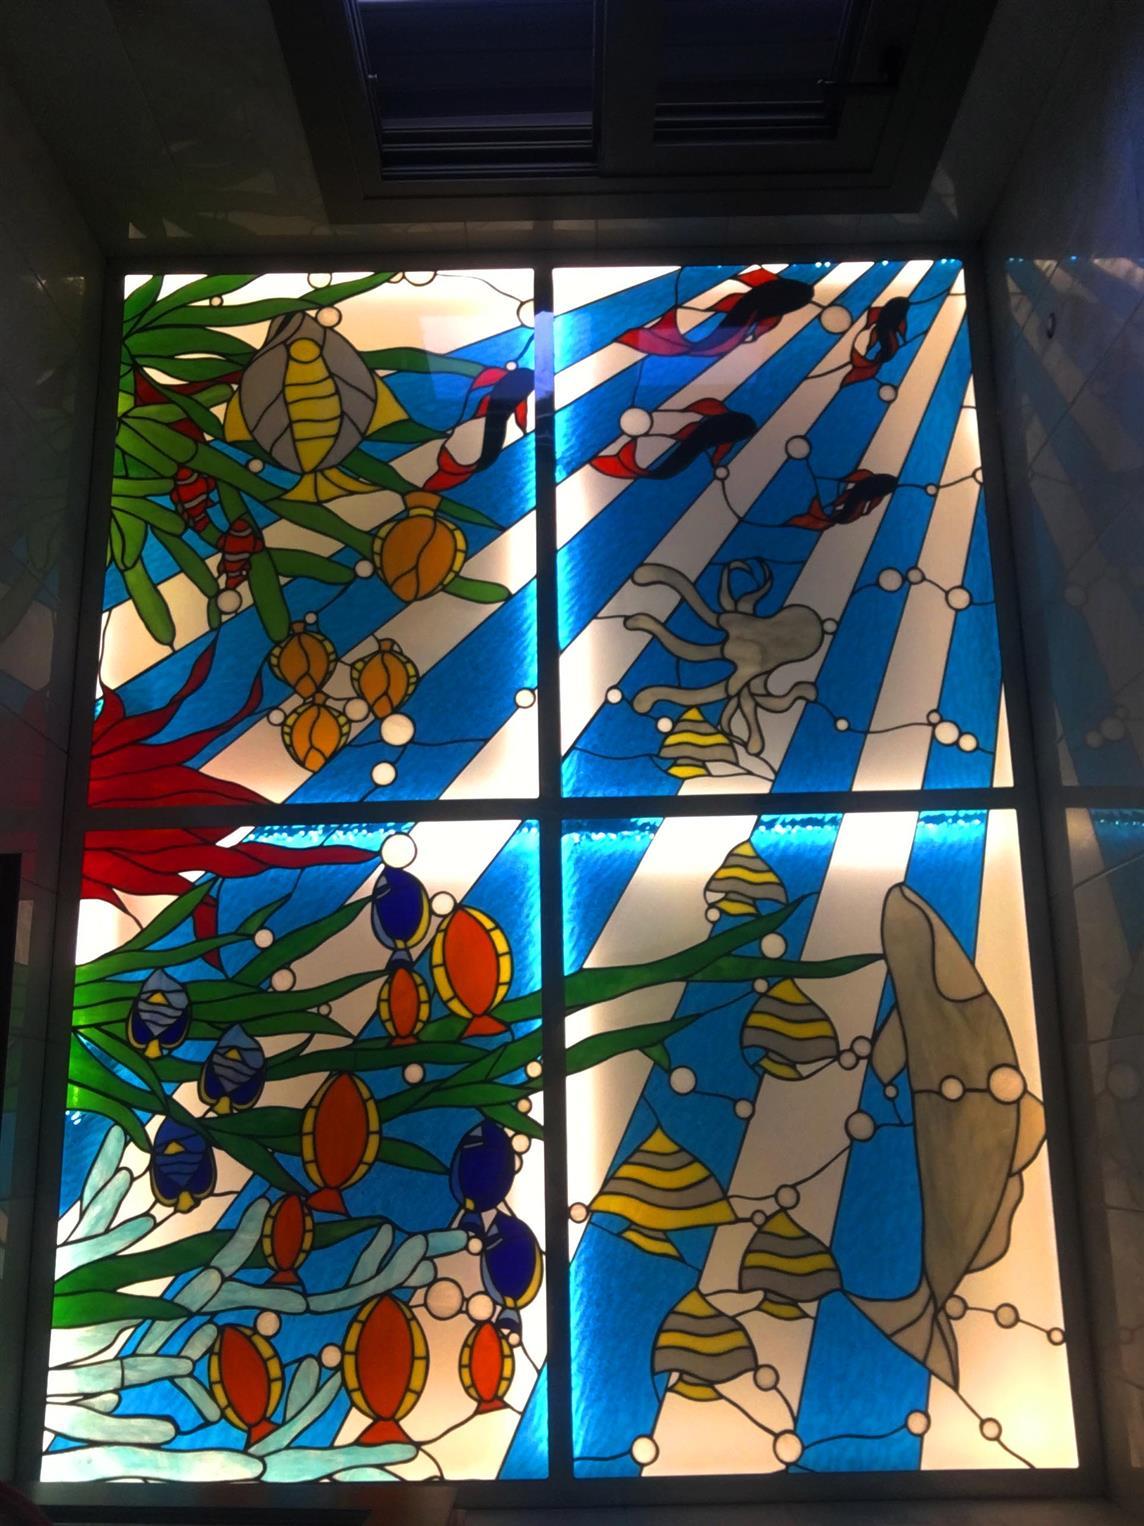 hamam-banyo-tavan-vitraylari201712211852157.jpg izmir vitray çalışması